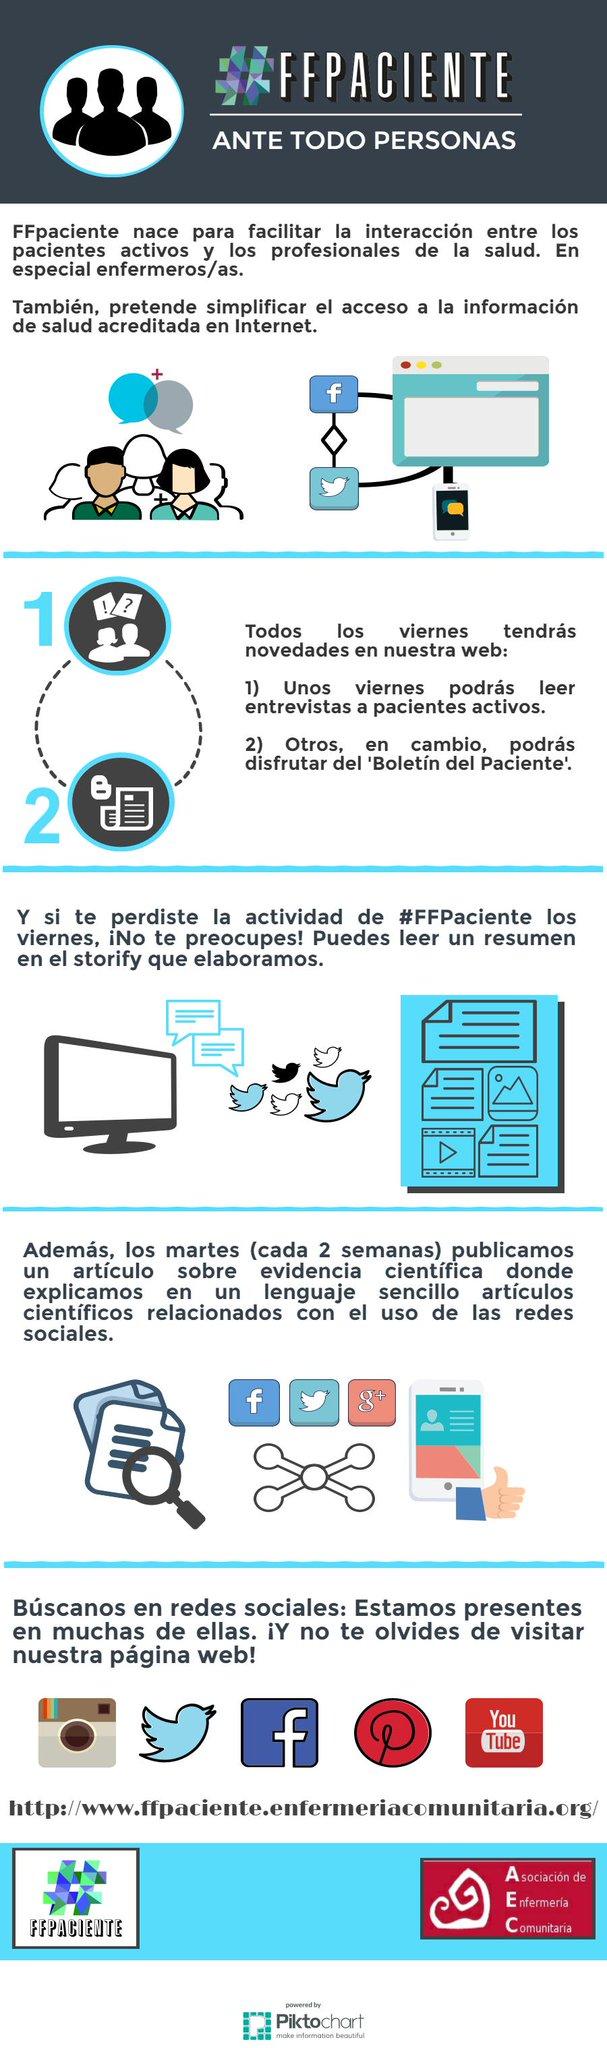 Thumbnail for #FFpaciente 10-02-2017